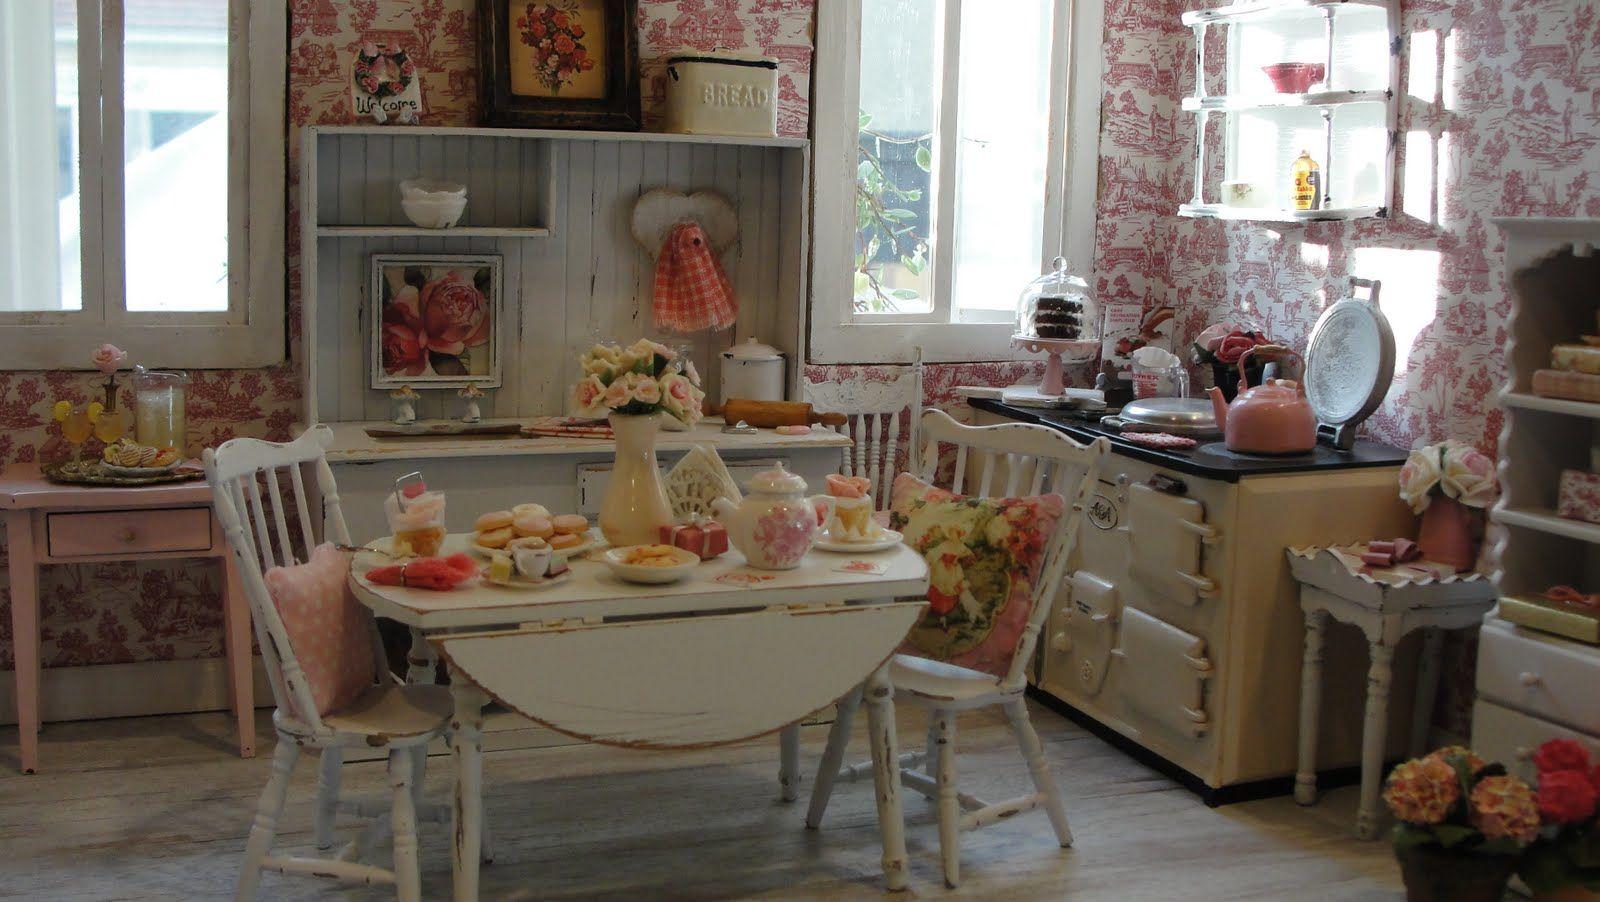 Miniature shabby chic kitchen scene for blythe pinterest - Kitchen chic ...